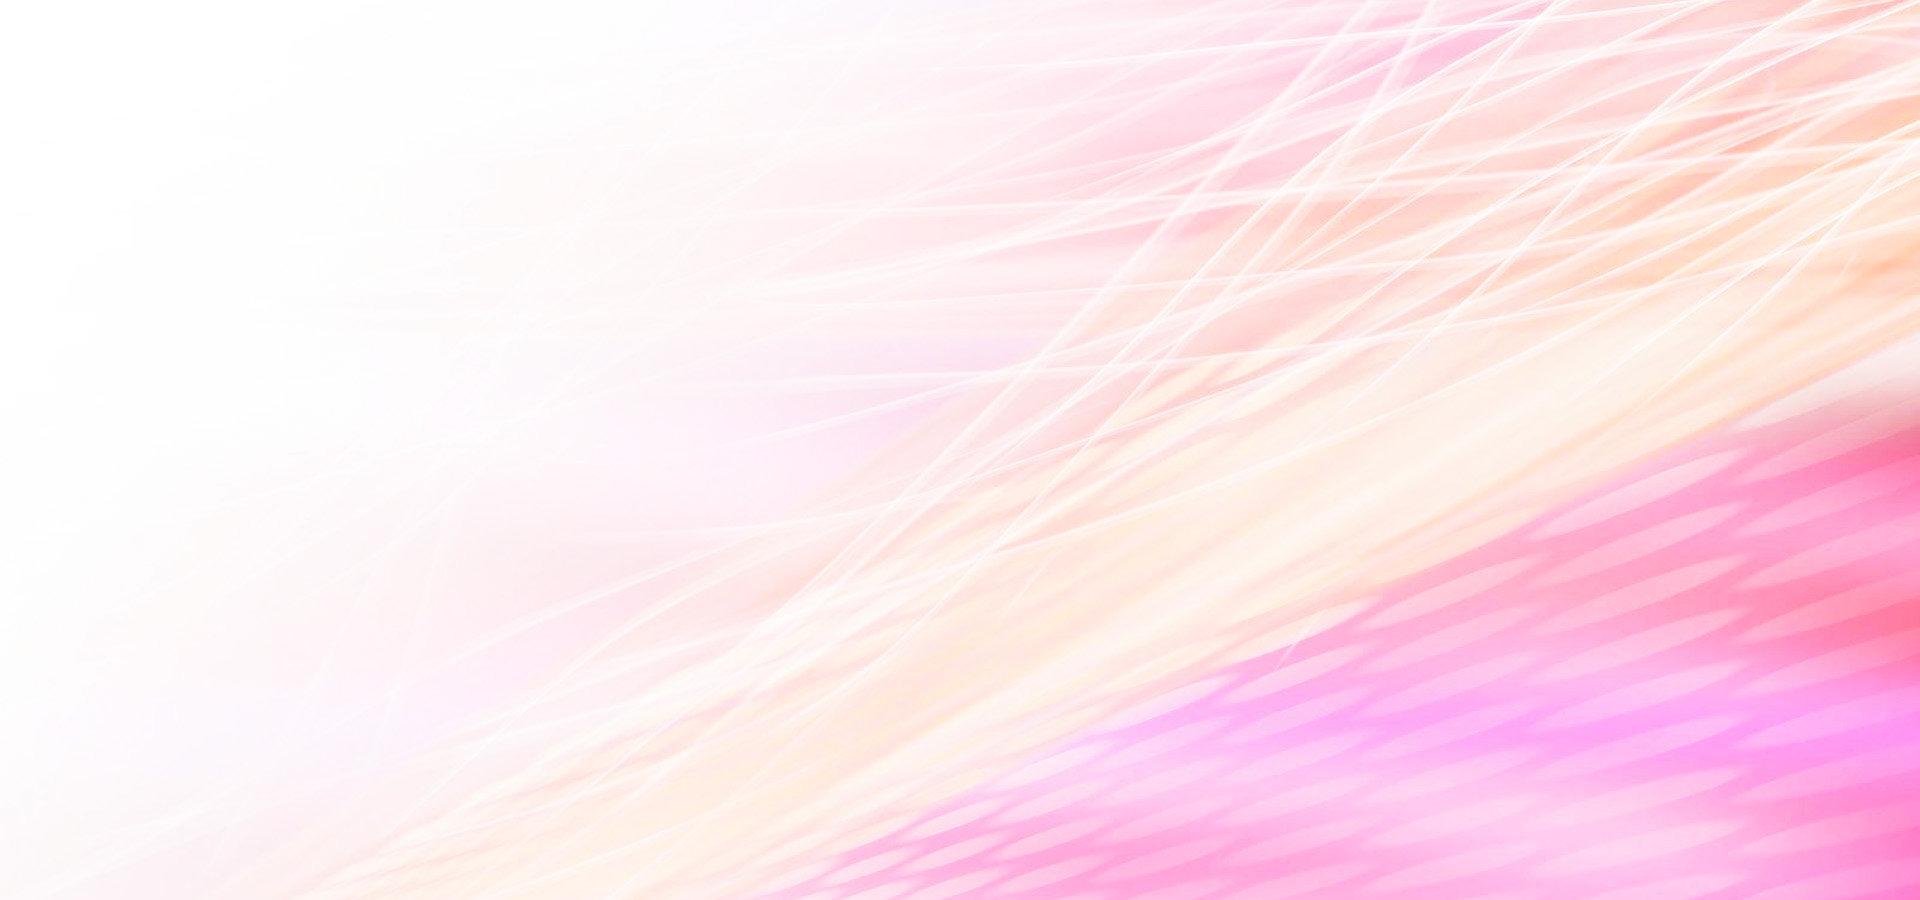 MPlus Spectra - Unleash Your Free Spirit